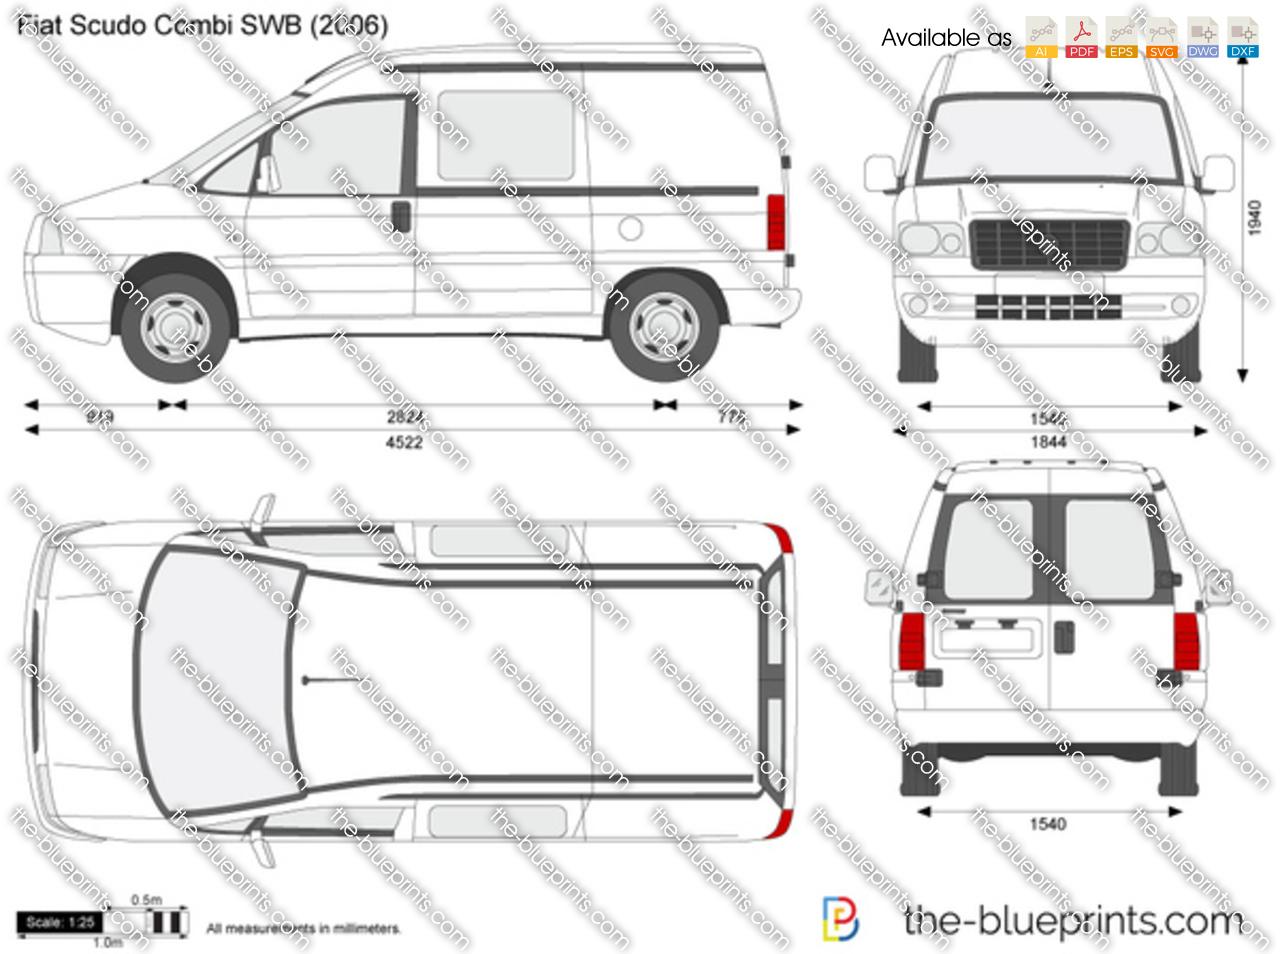 The Vector Drawing Fiat Scudo Combi Swb